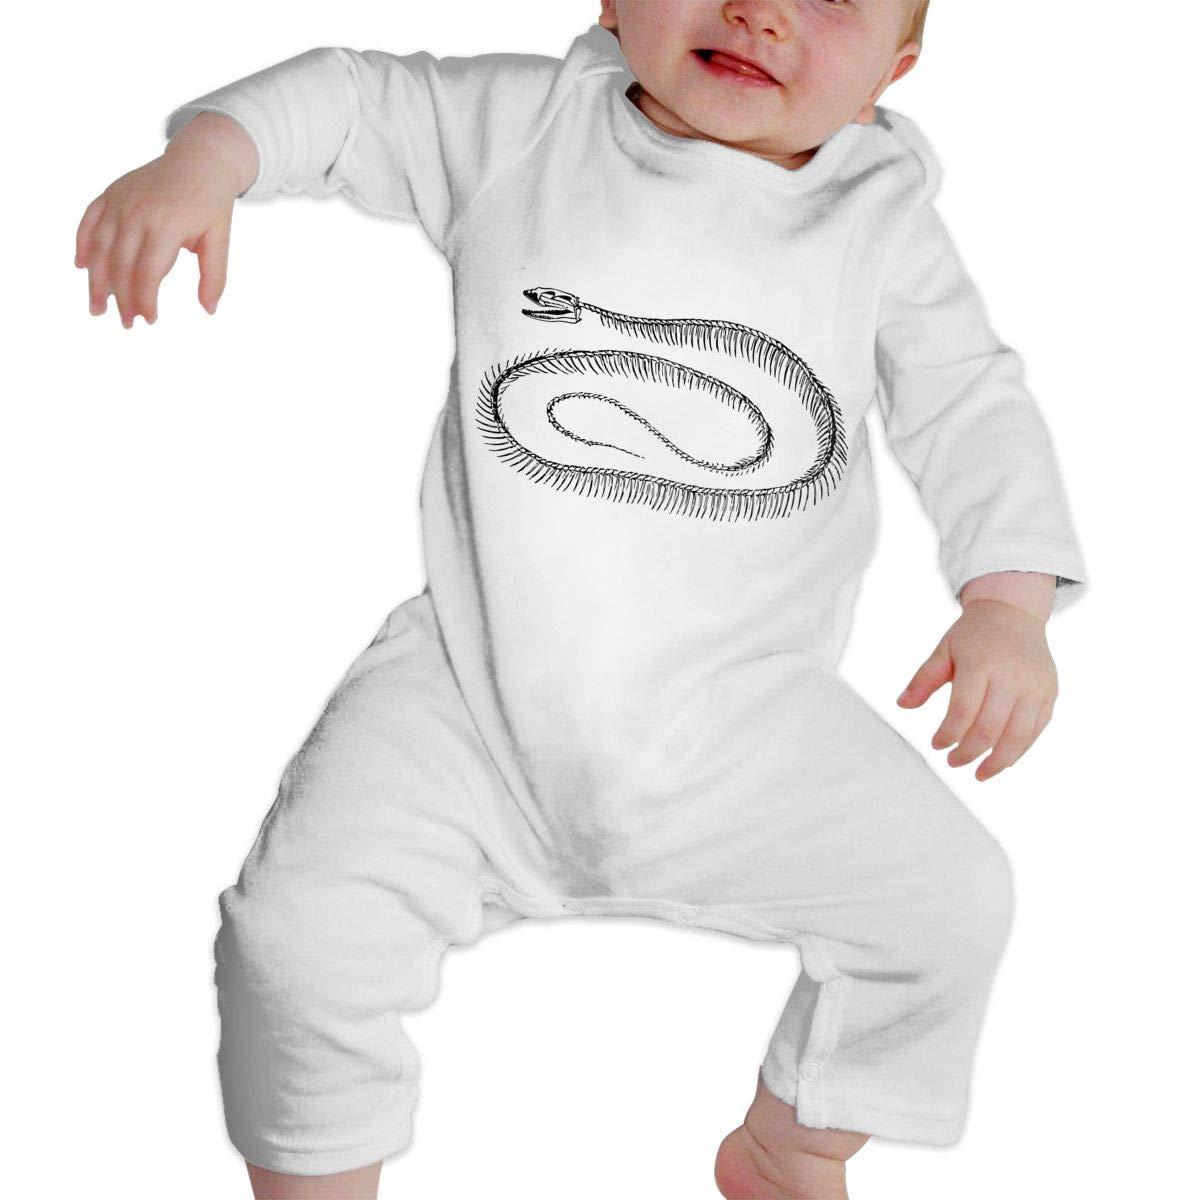 NOALKJ Babys Long Sleeve Romper,Snake Jumpsuit Bodysuit Clothes